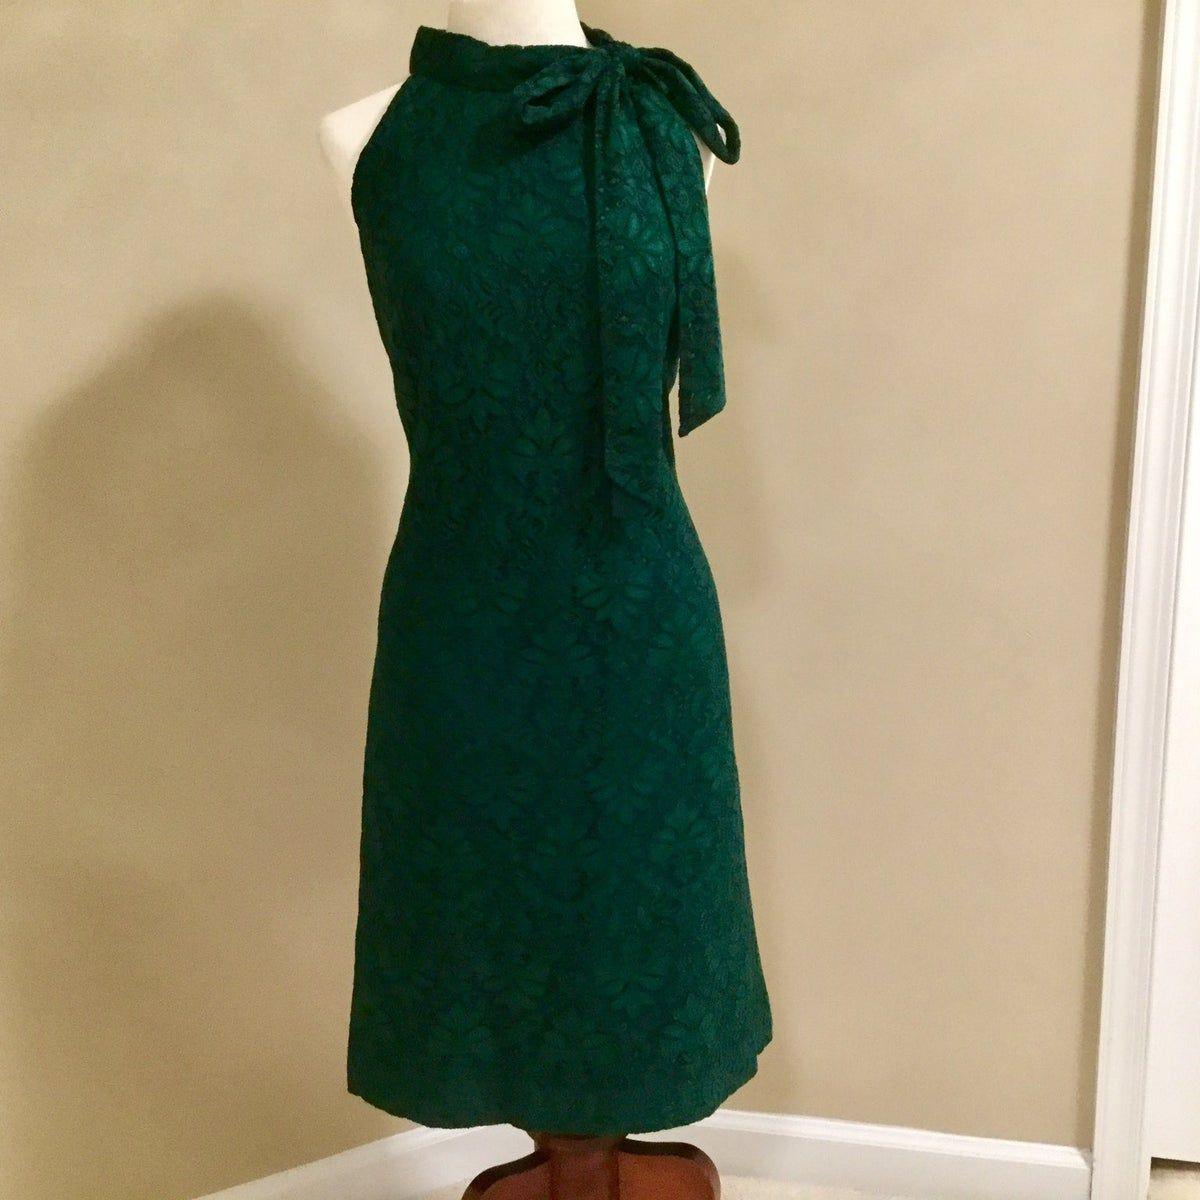 Green Halter Lace Vince Camuto Dress On Mercari Dresses Halterneck Dress Lace Dress [ 1200 x 1200 Pixel ]